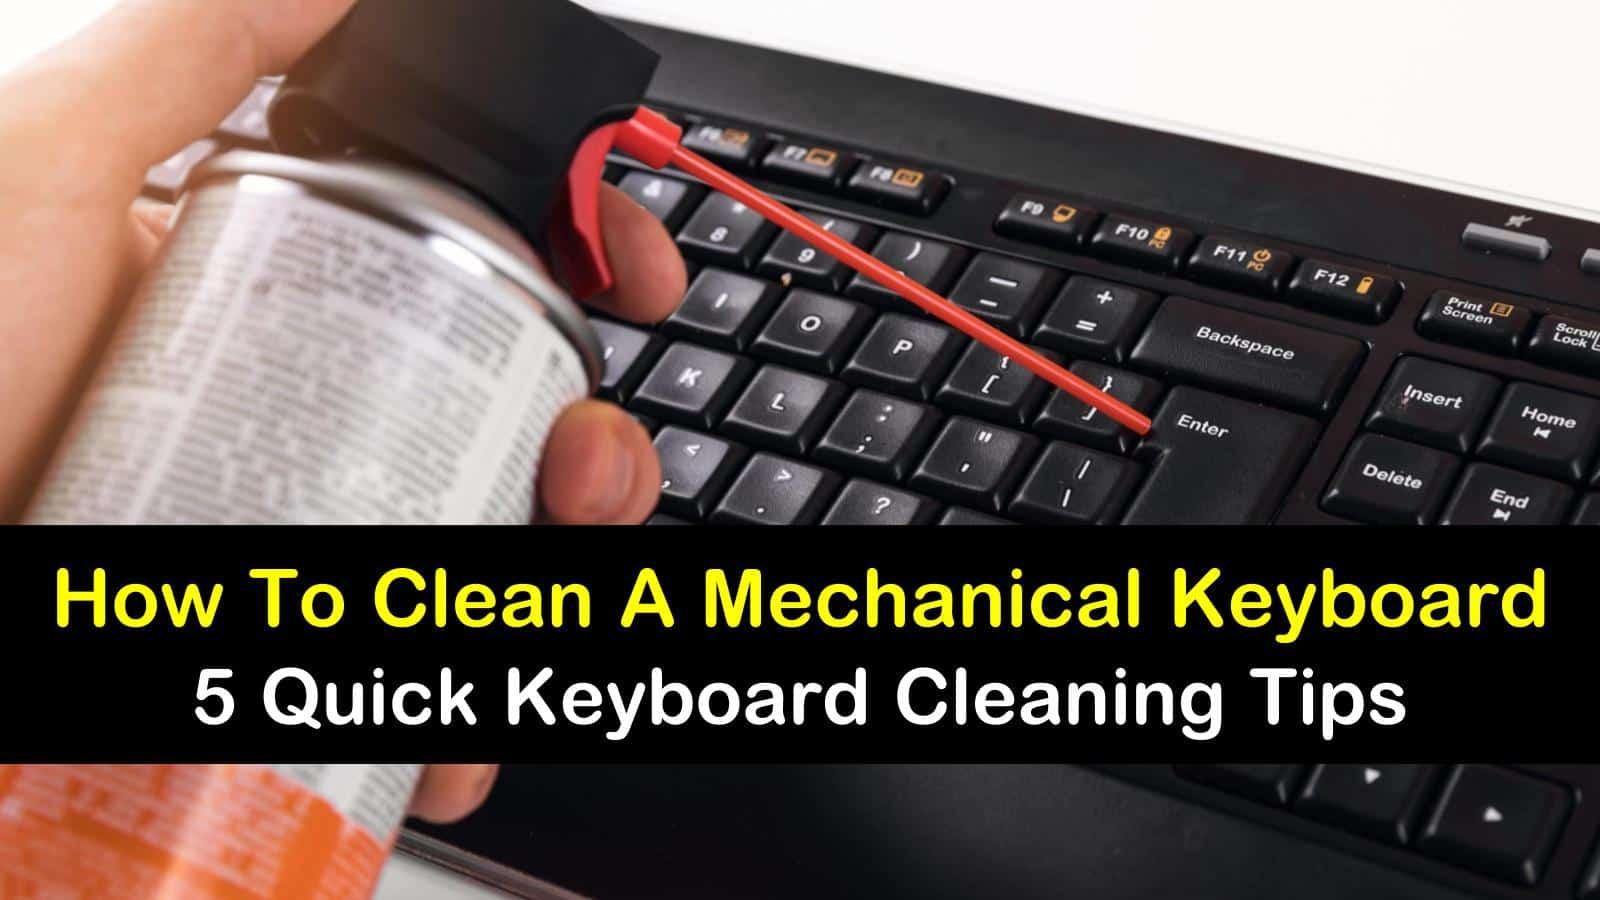 how to clean a mechanical keyboard titleimg1